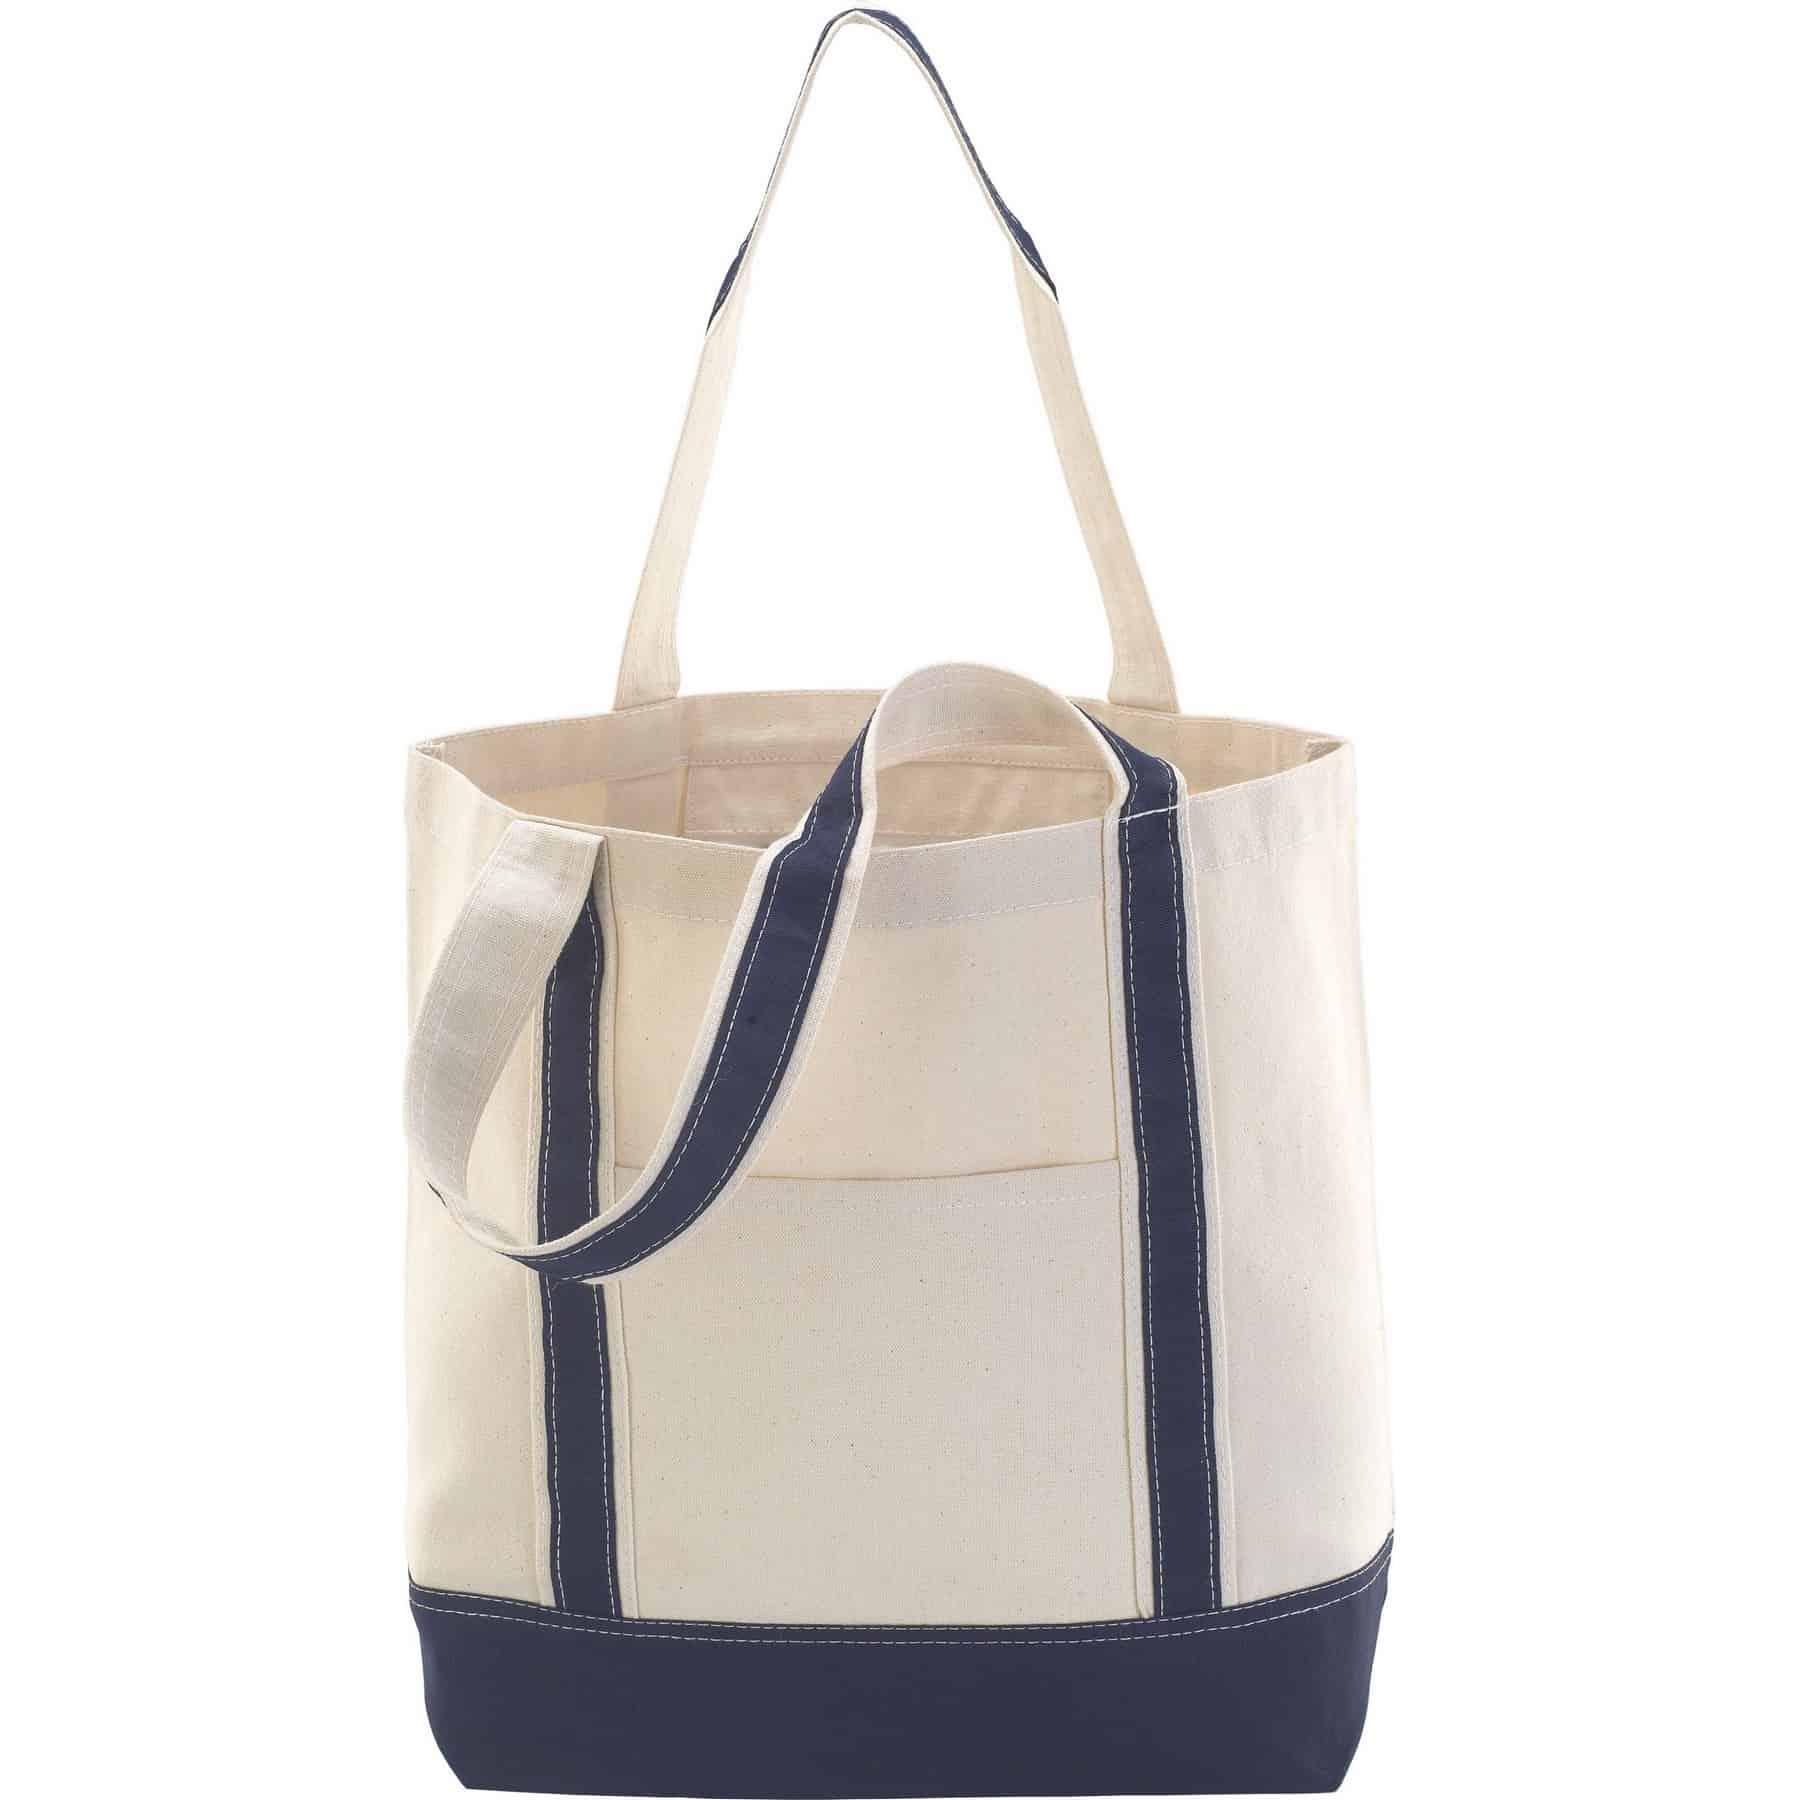 2956 navy bag